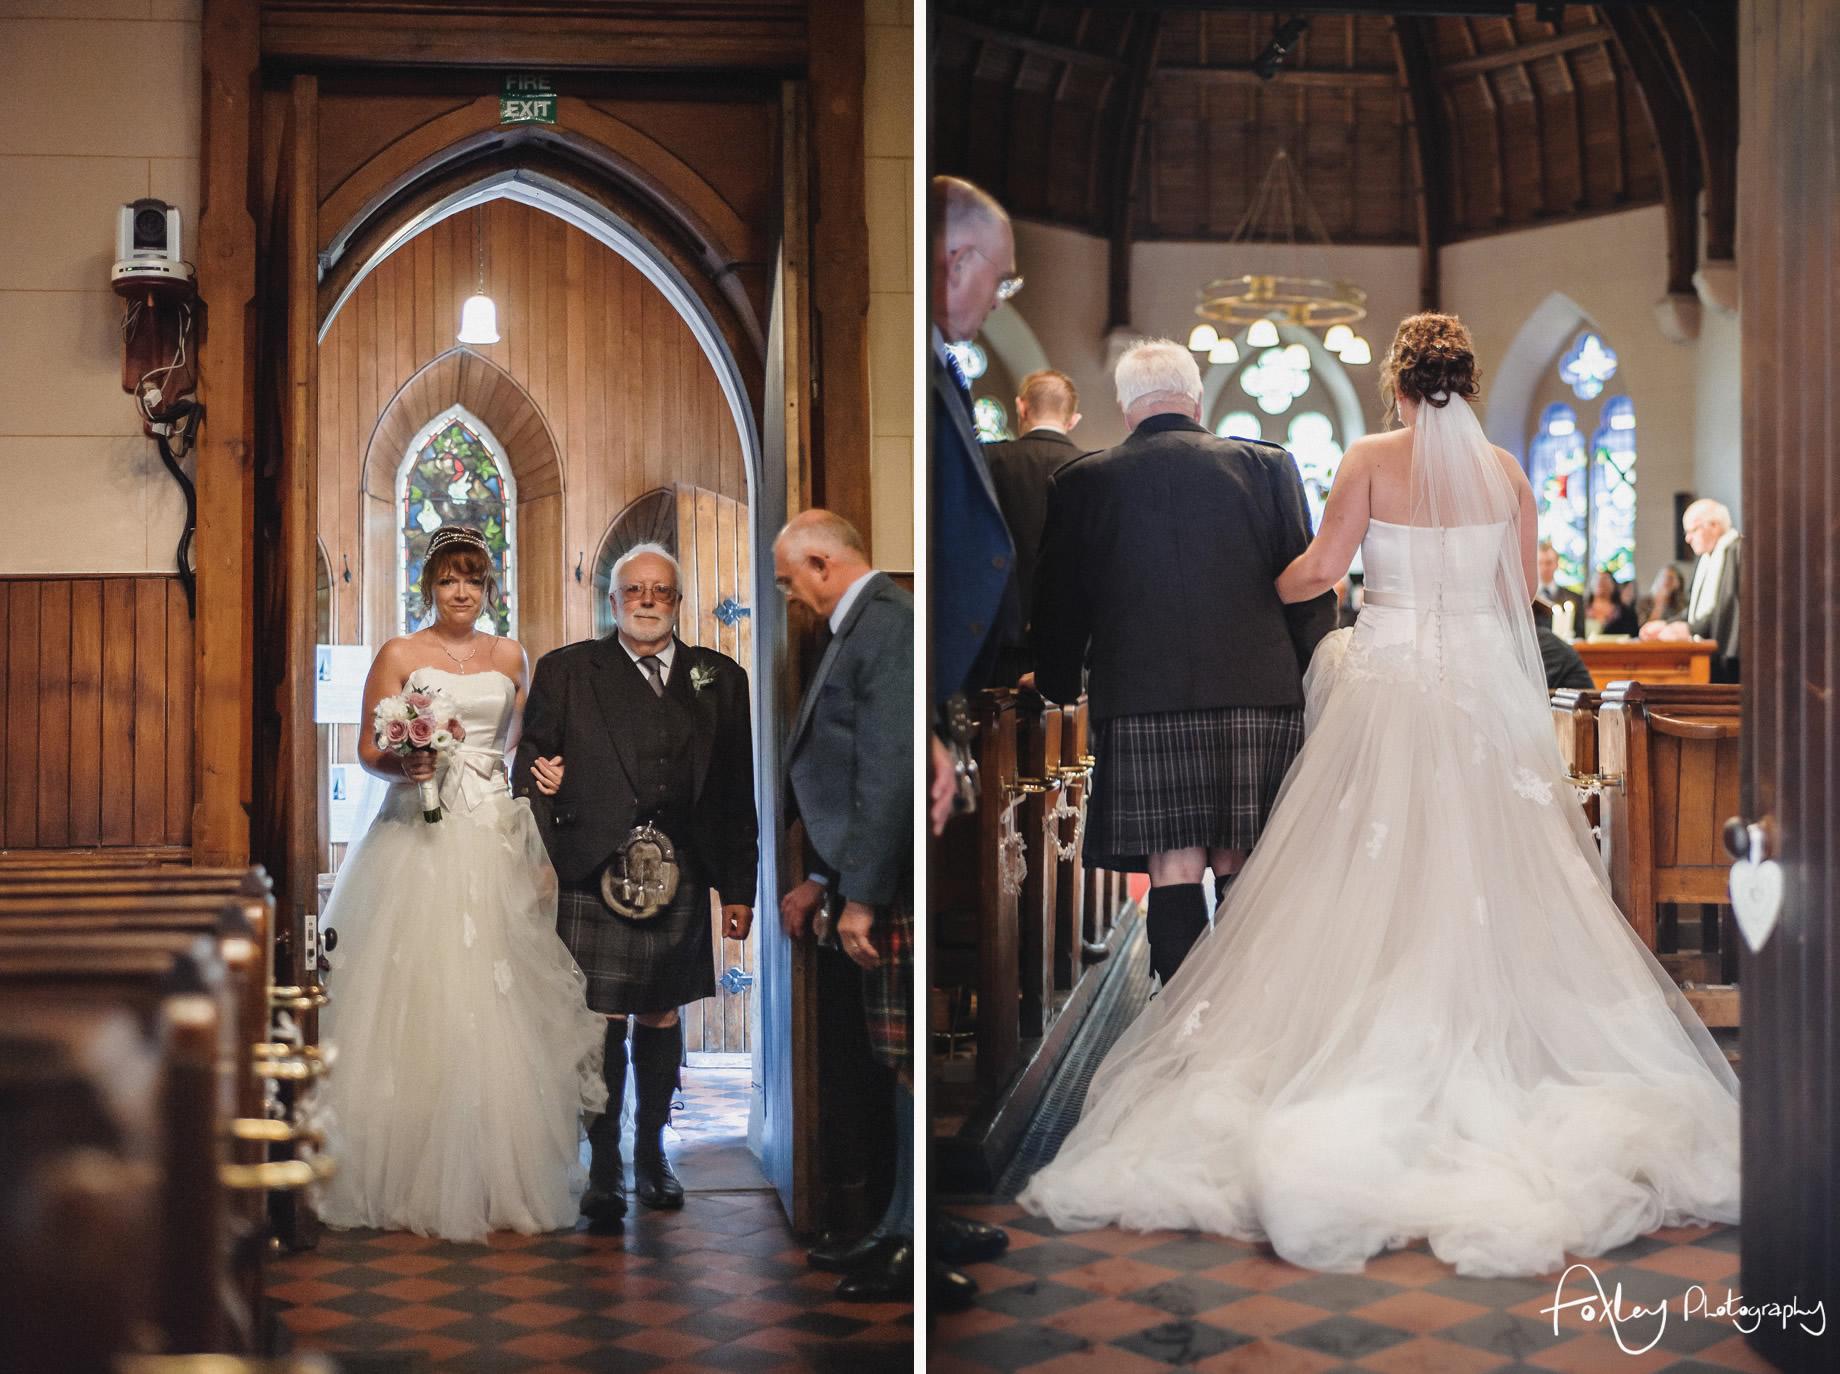 Alys-And-Davids-Wedding-Loch-Lomond-086